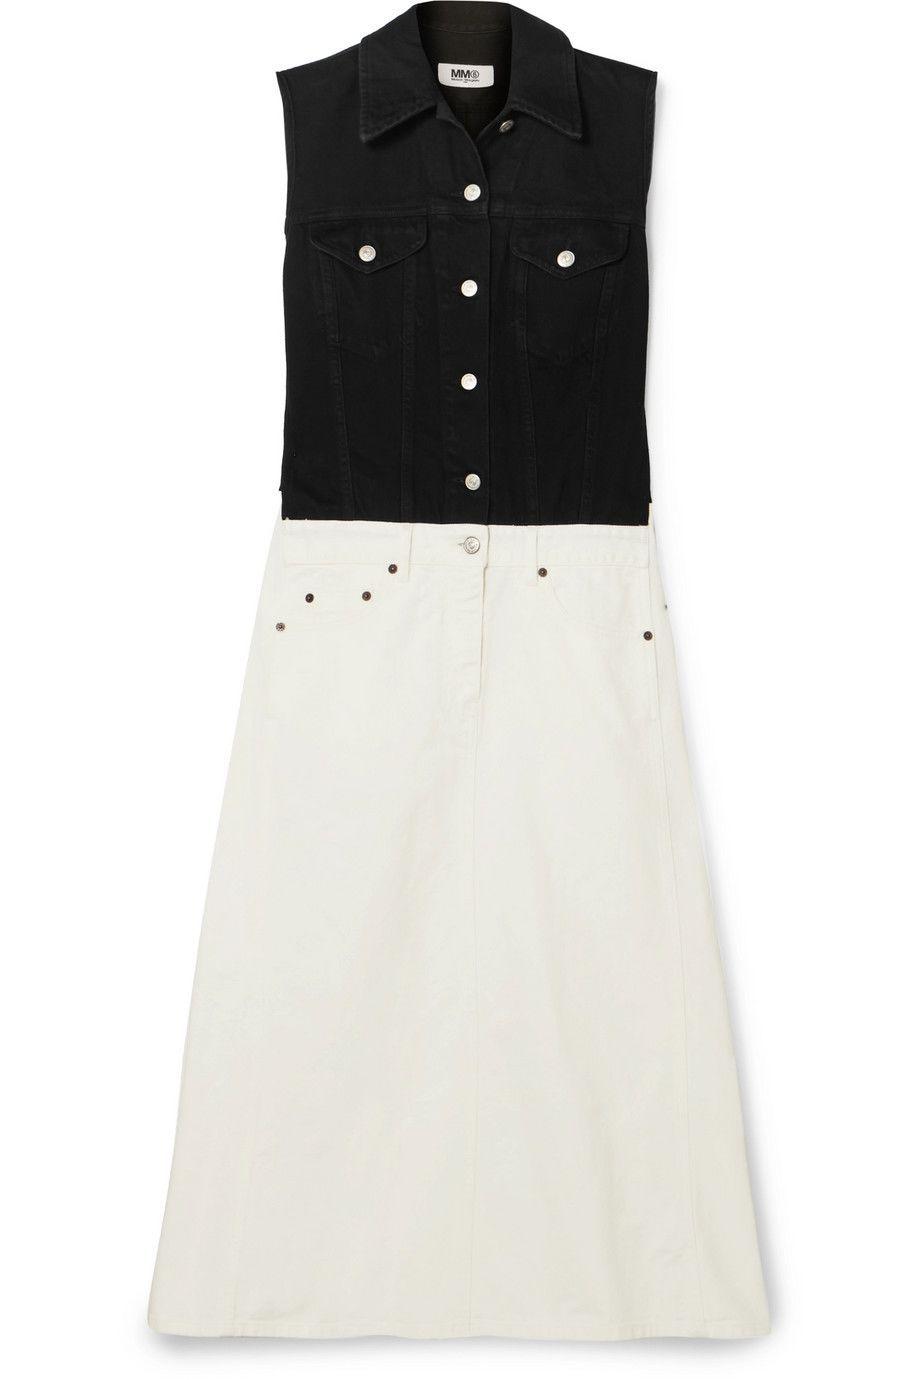 #PopbelaOOTD: Statement Dress untuk ke Festival Musik